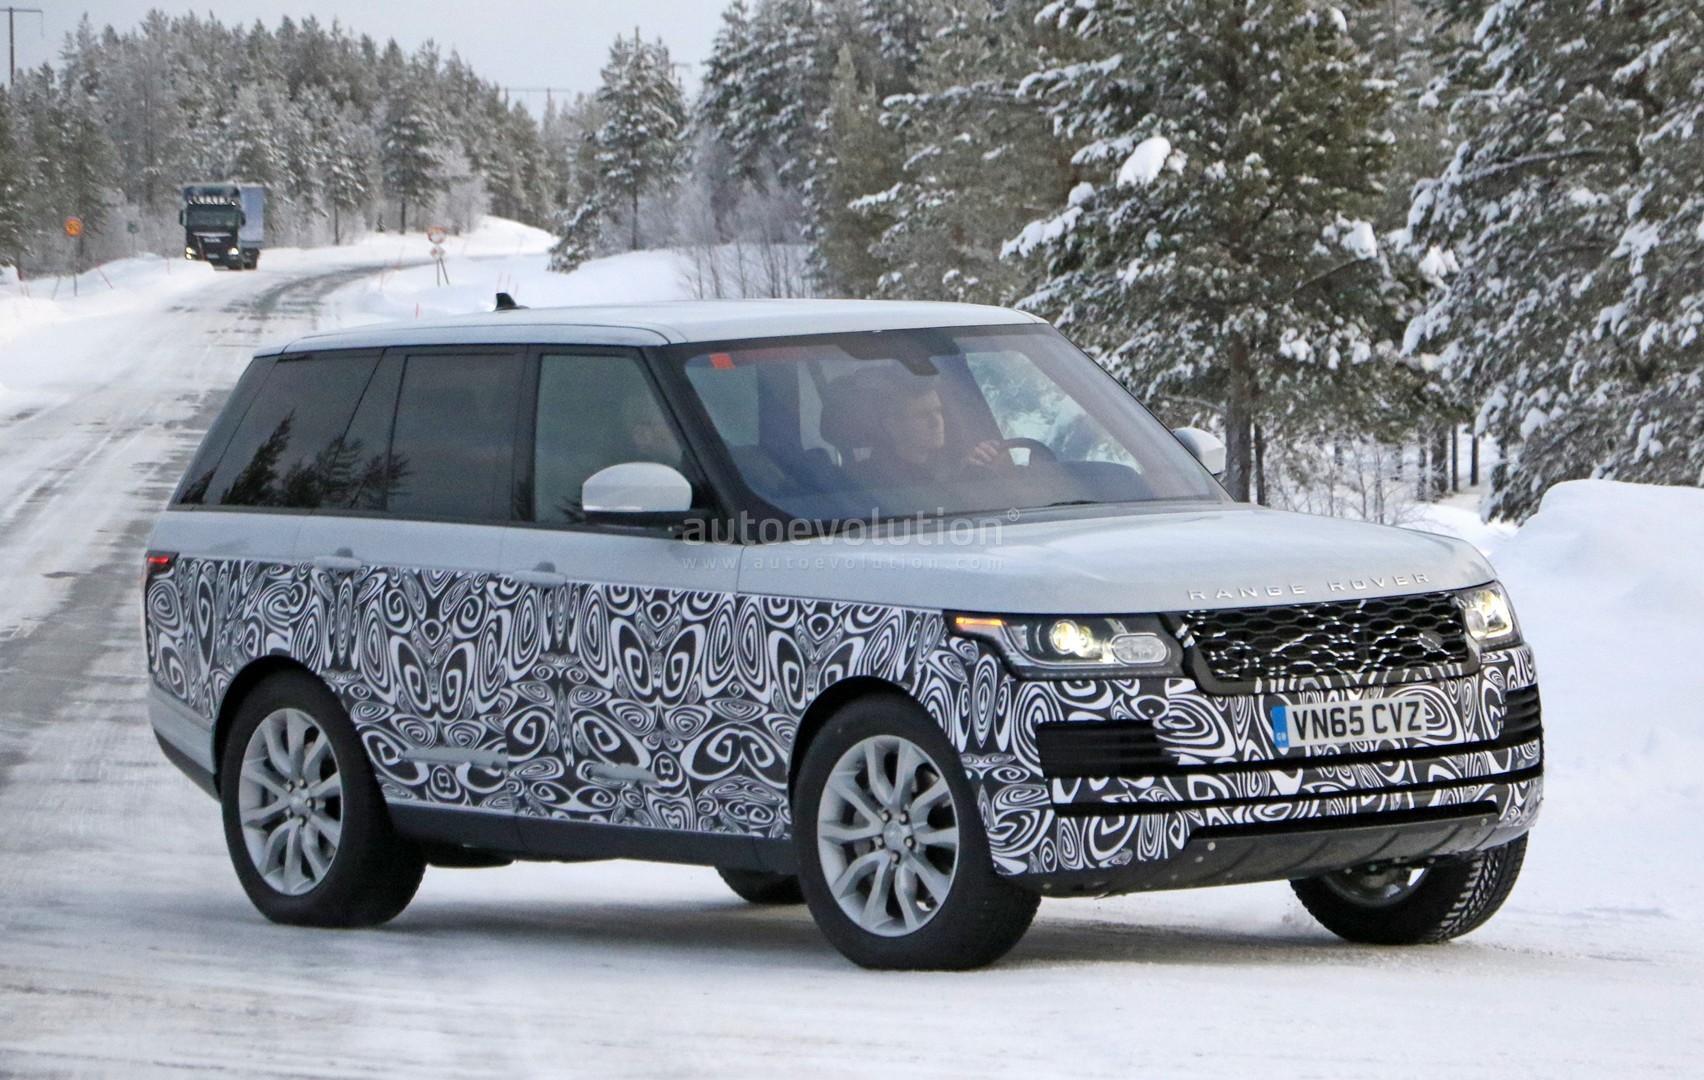 Spyshots 2017 Range Rover Facelift Undergoes Winter